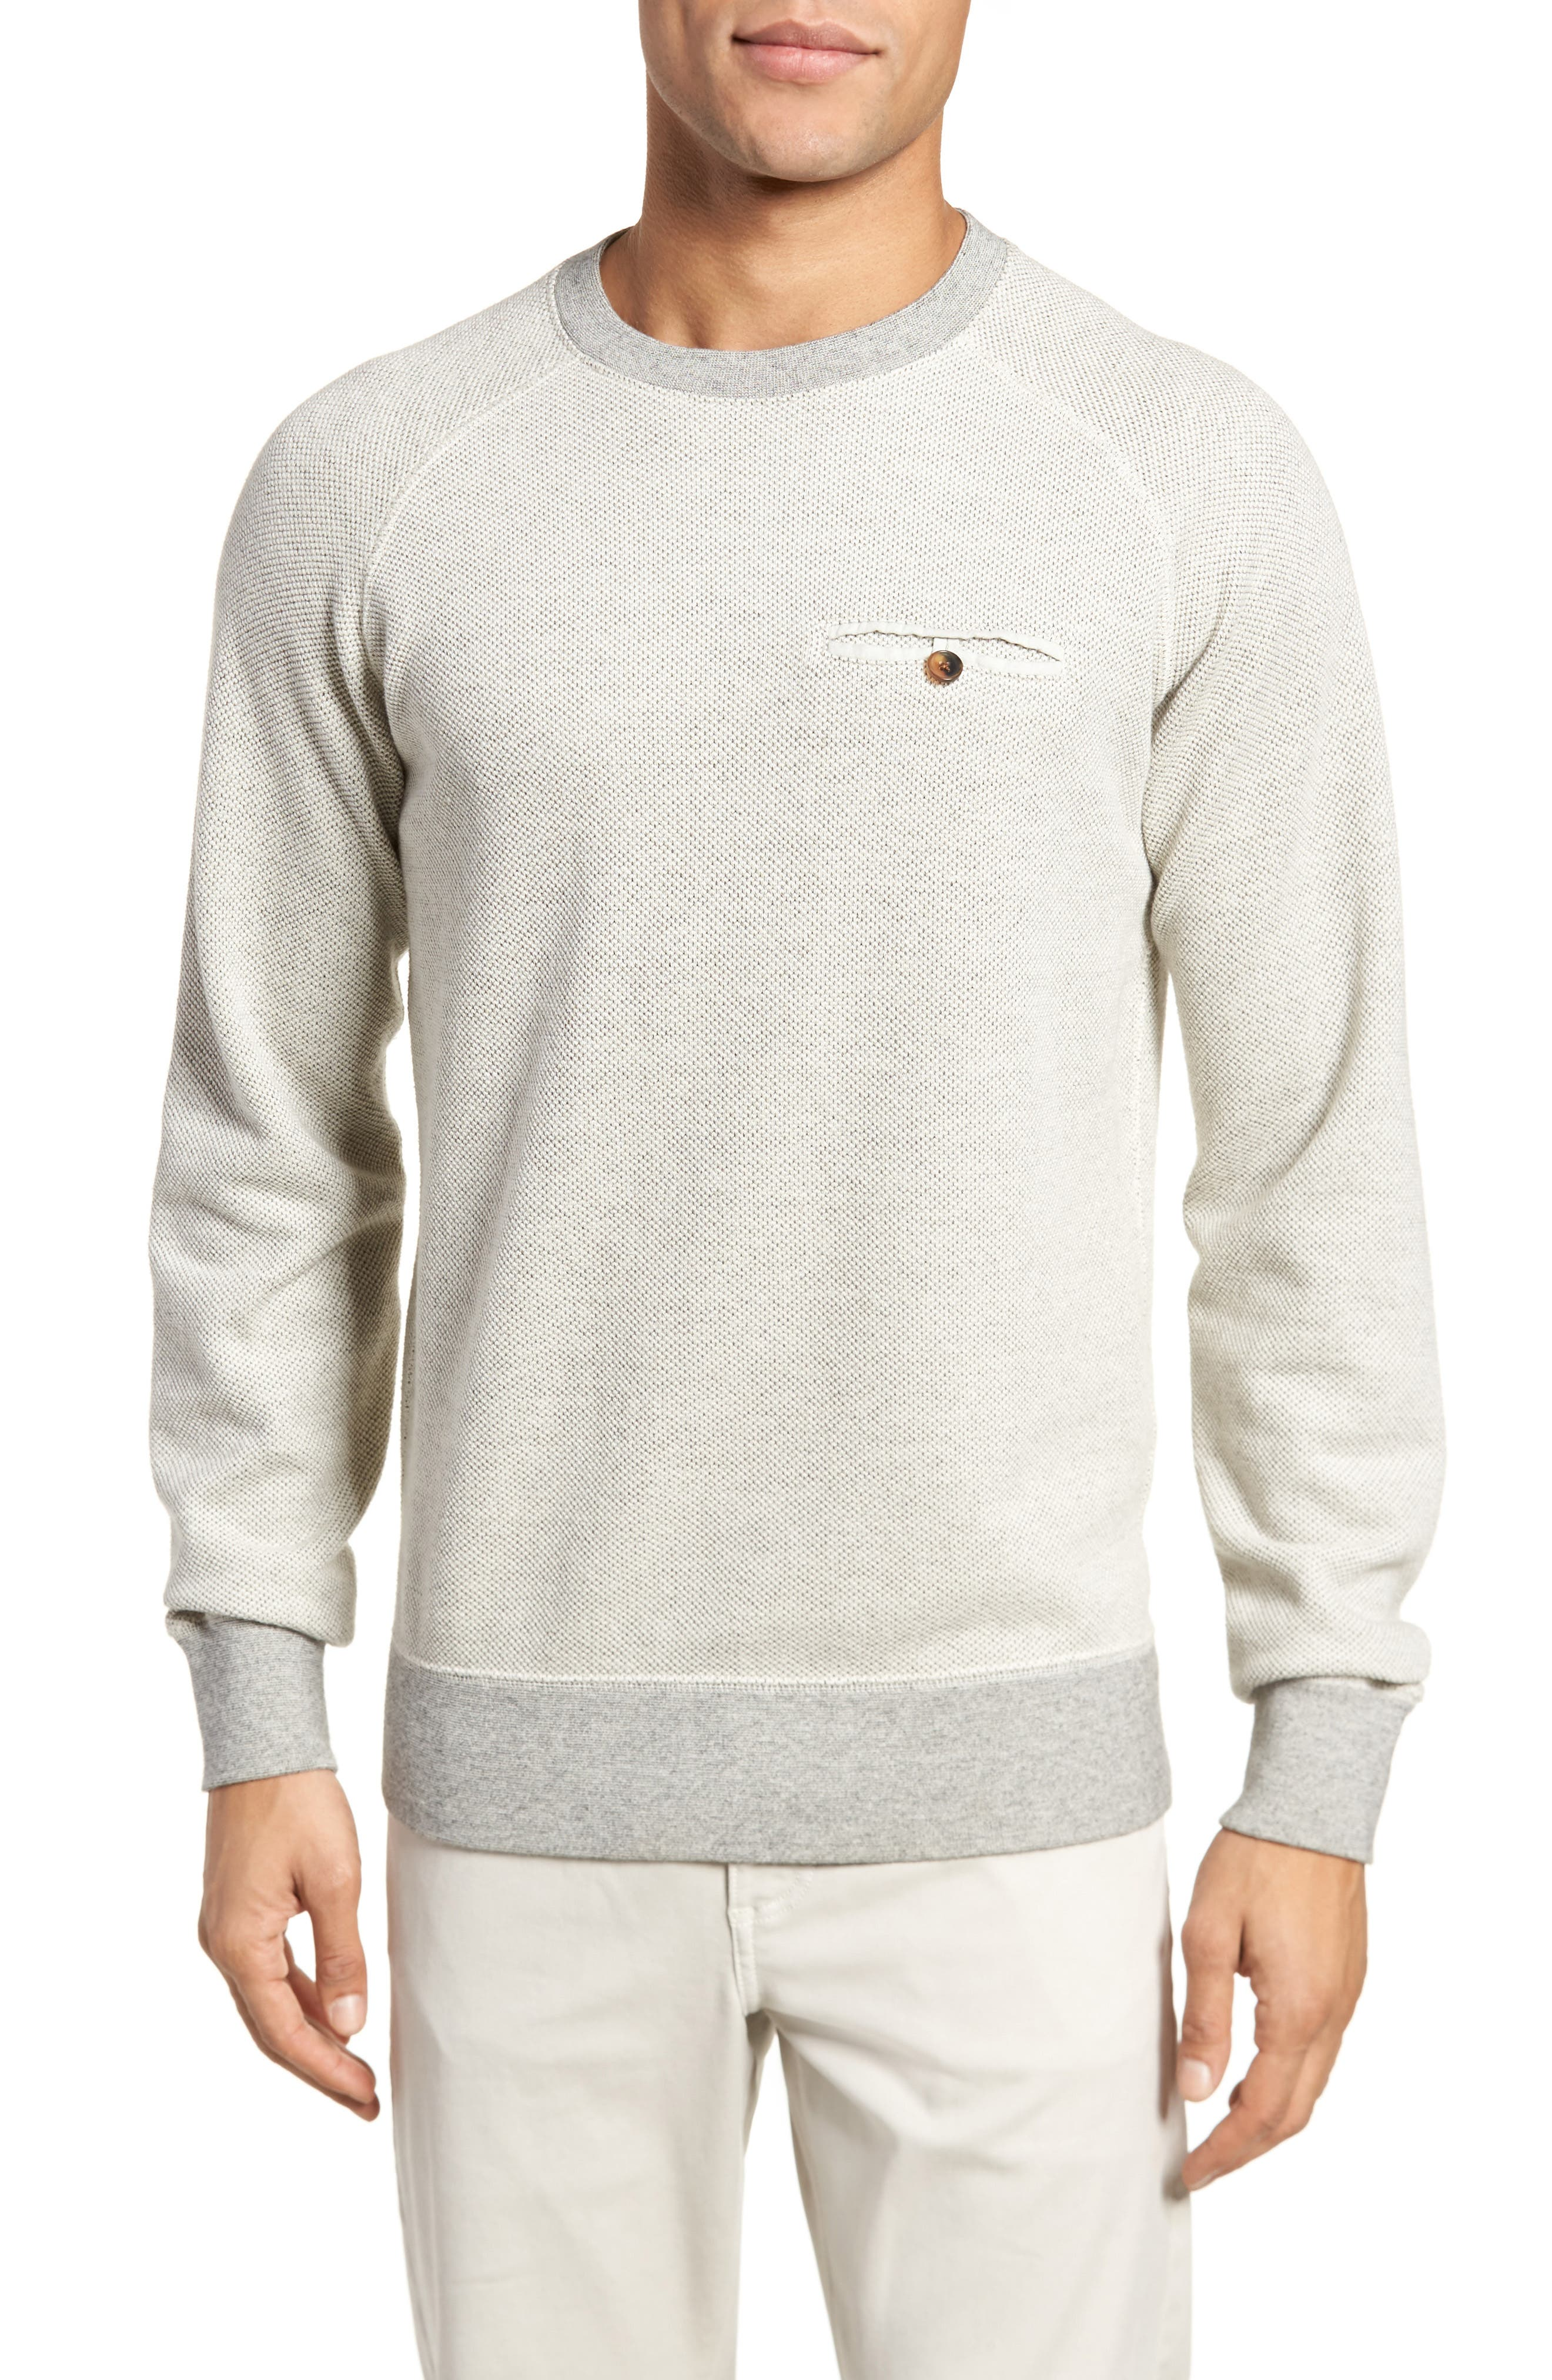 Tommy Pullover Sweatshirt,                         Main,                         color, Light Grey